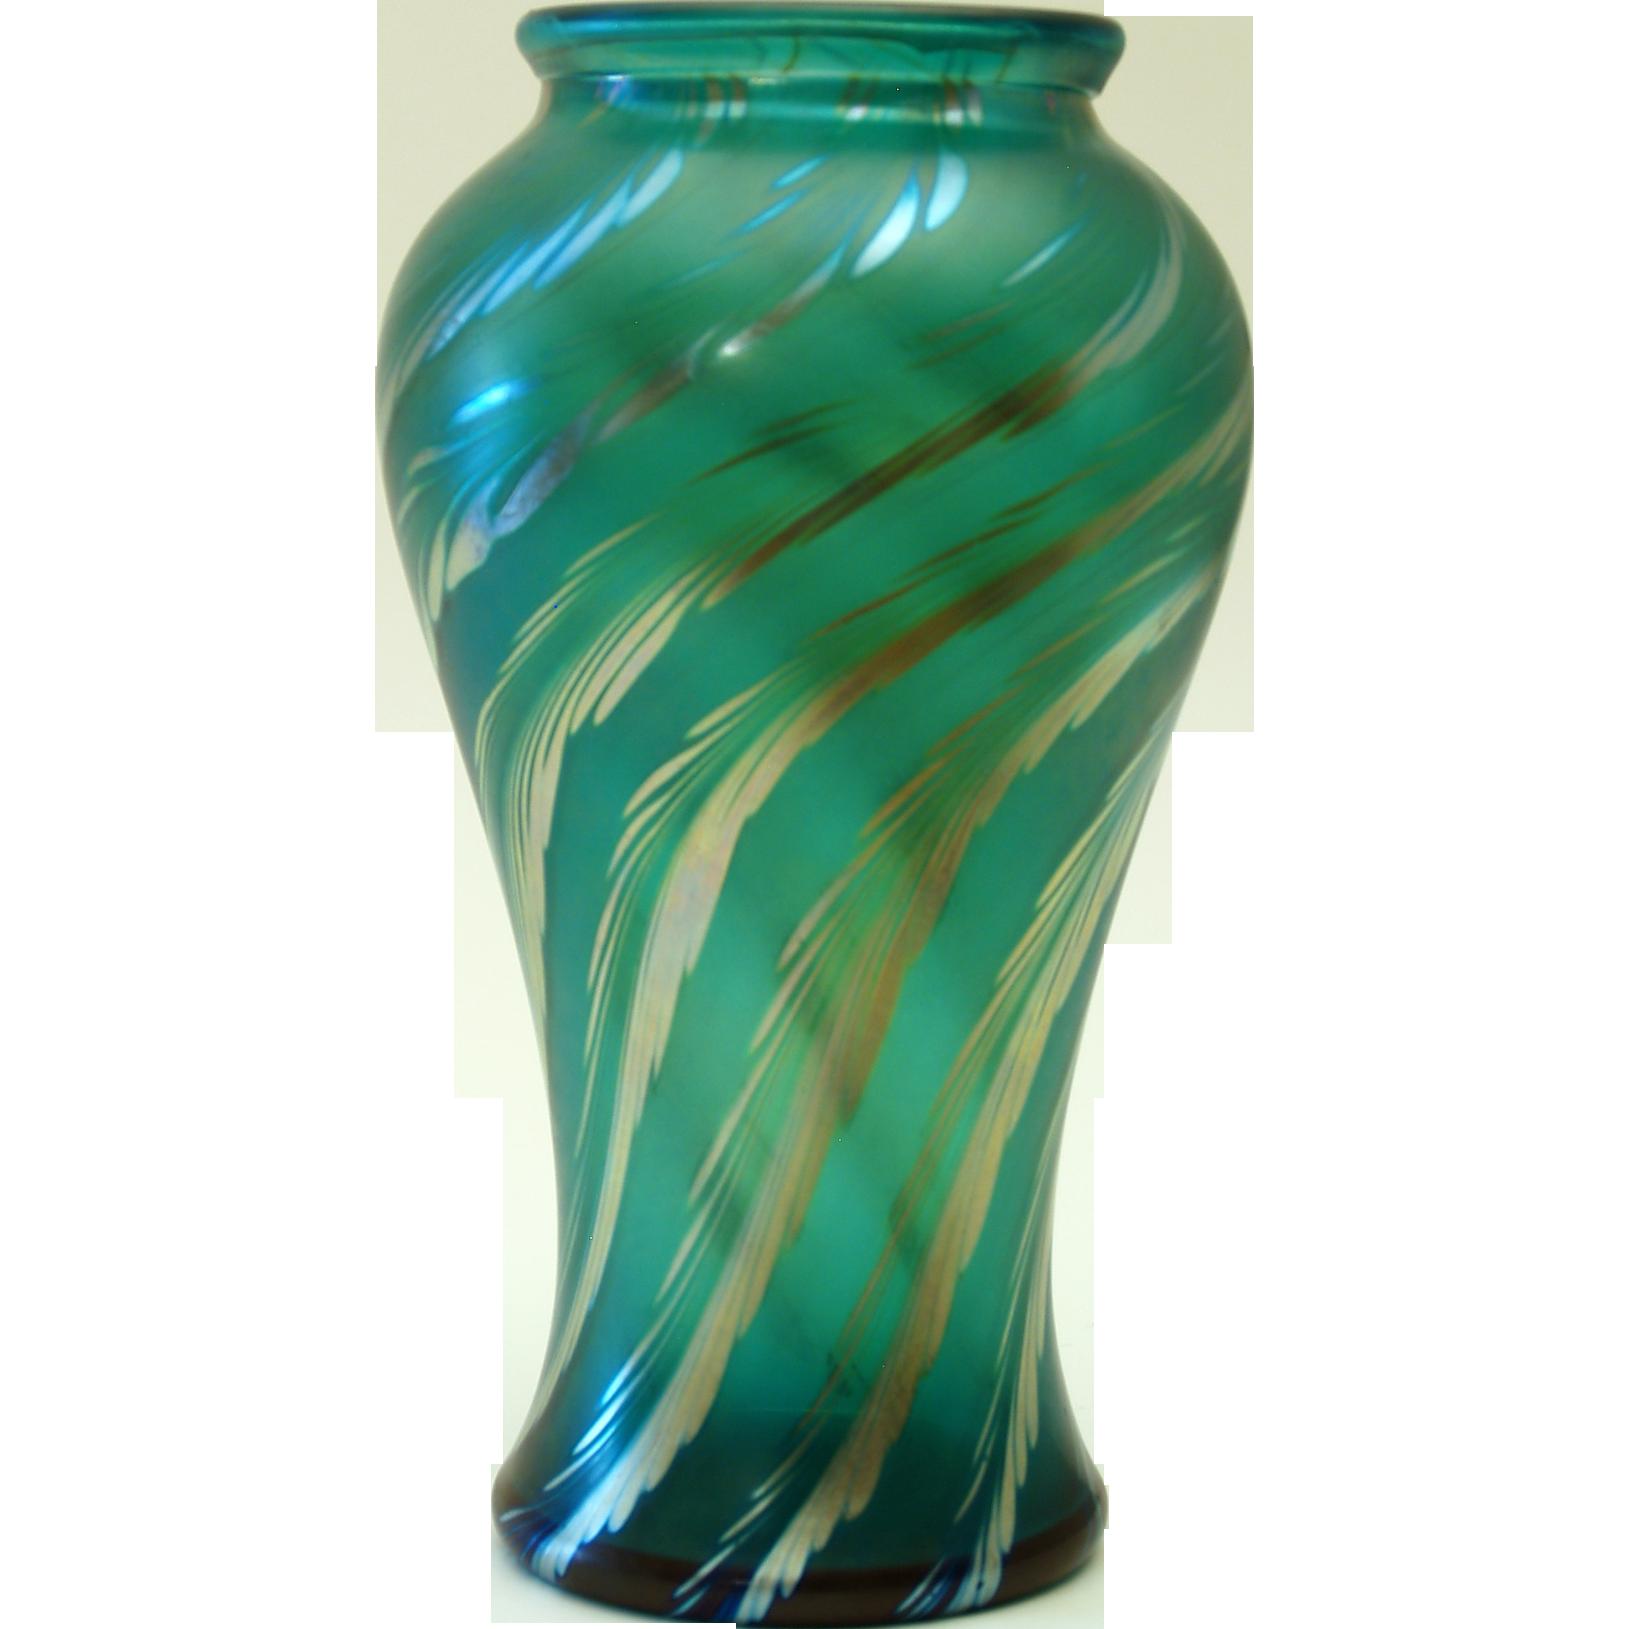 Emerald Art Glass correia emerald green art glass vase from melange-orange on ruby lane